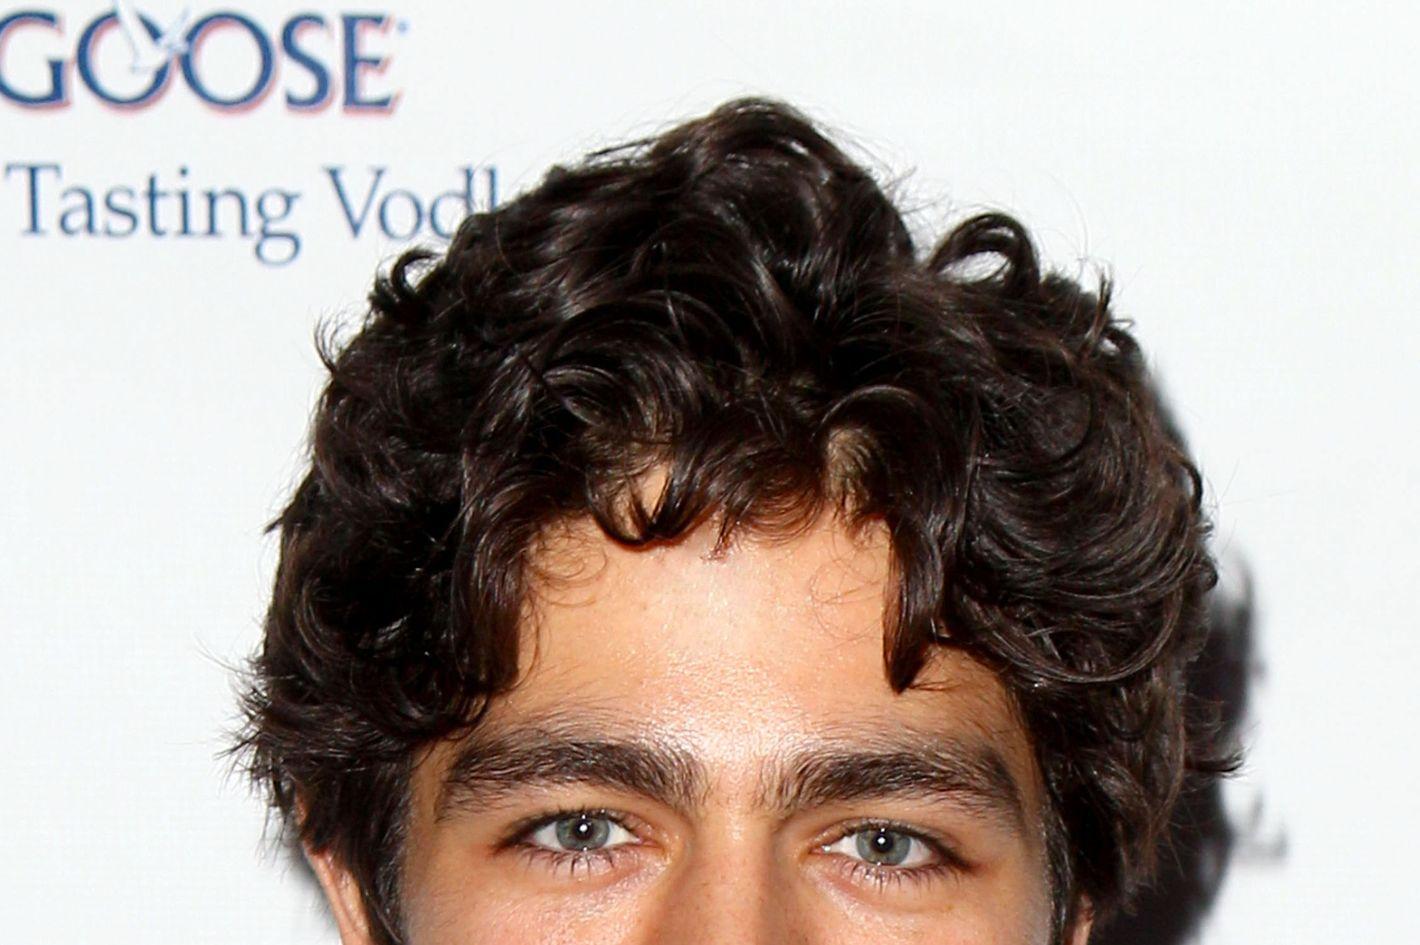 Male Gaze Adrian Greniers Curly Mop Of Hair